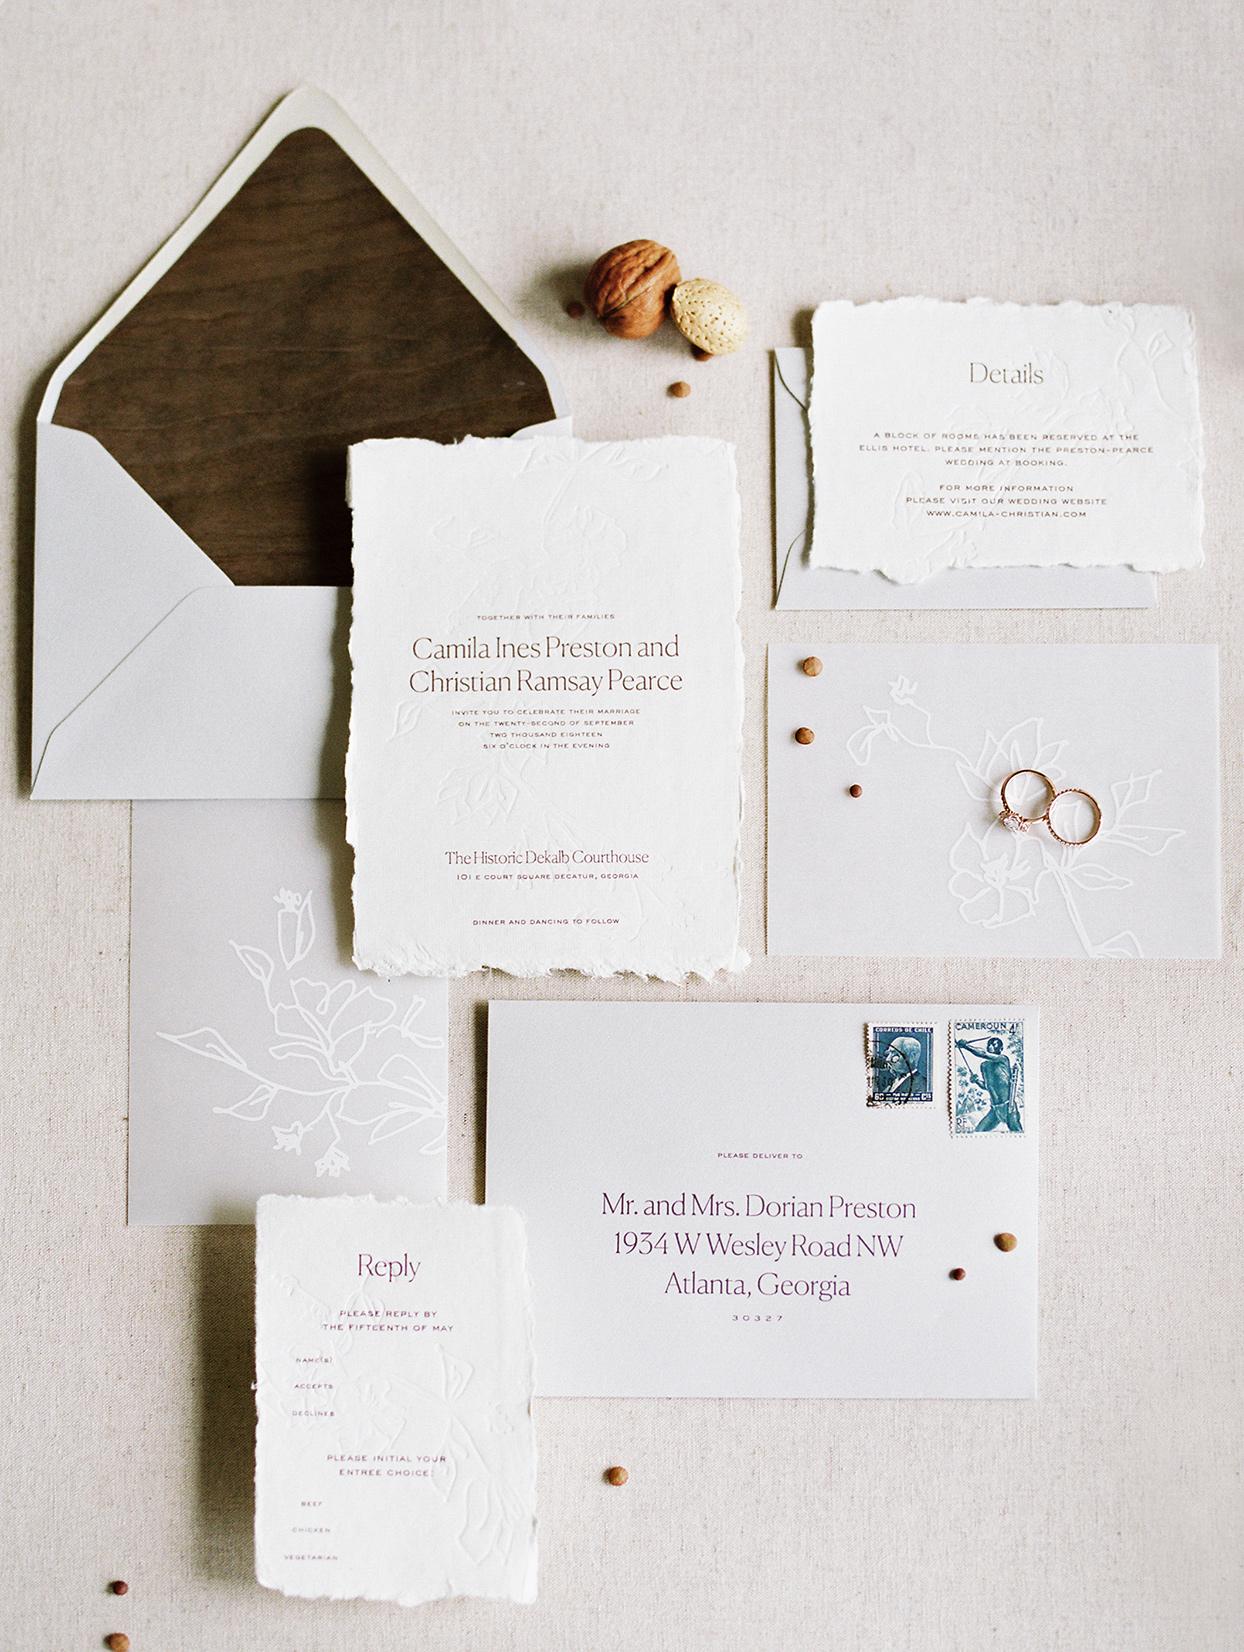 simple rustic wedding invitations with wood grain envelope lining